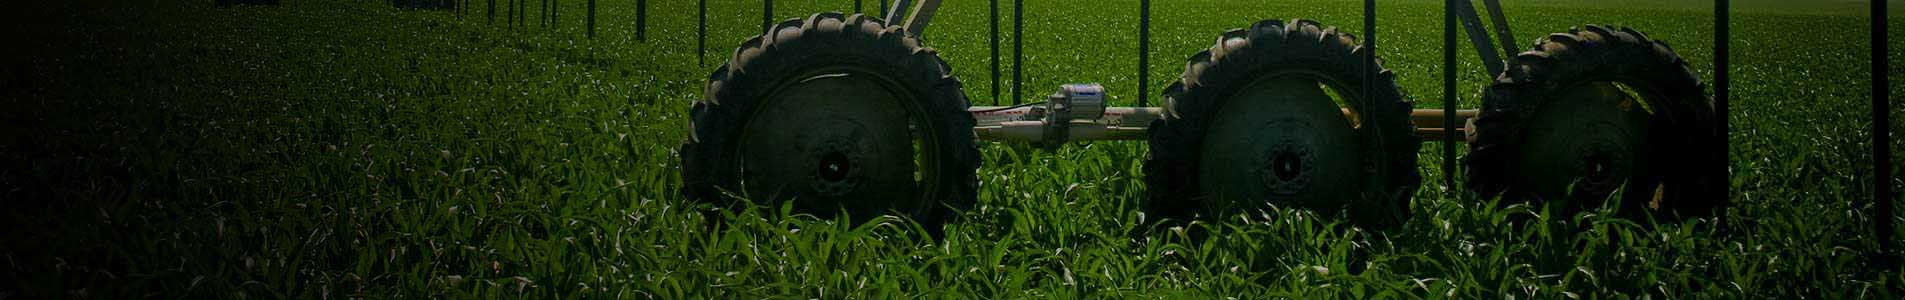 valley 3-wheel drive unit - irrigation tires